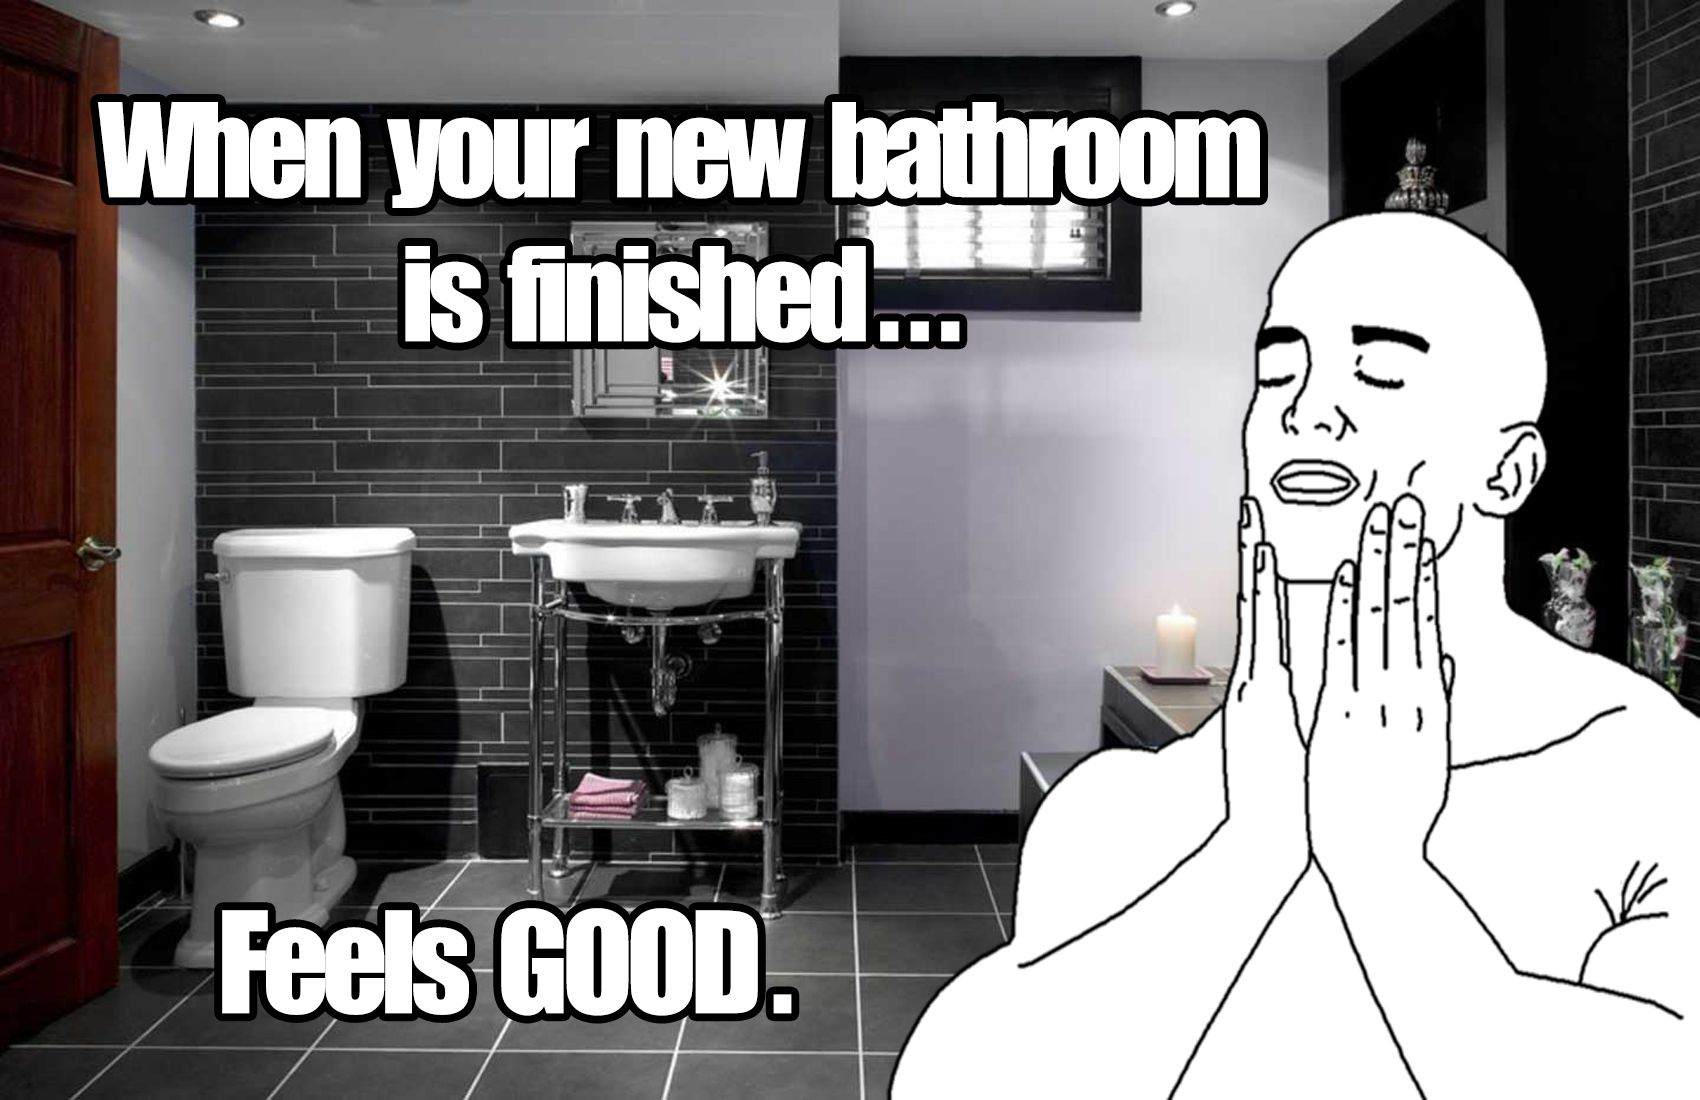 Bathroom Remodel Meme funny bathroom renovation memes | funny bathroom renovation memes